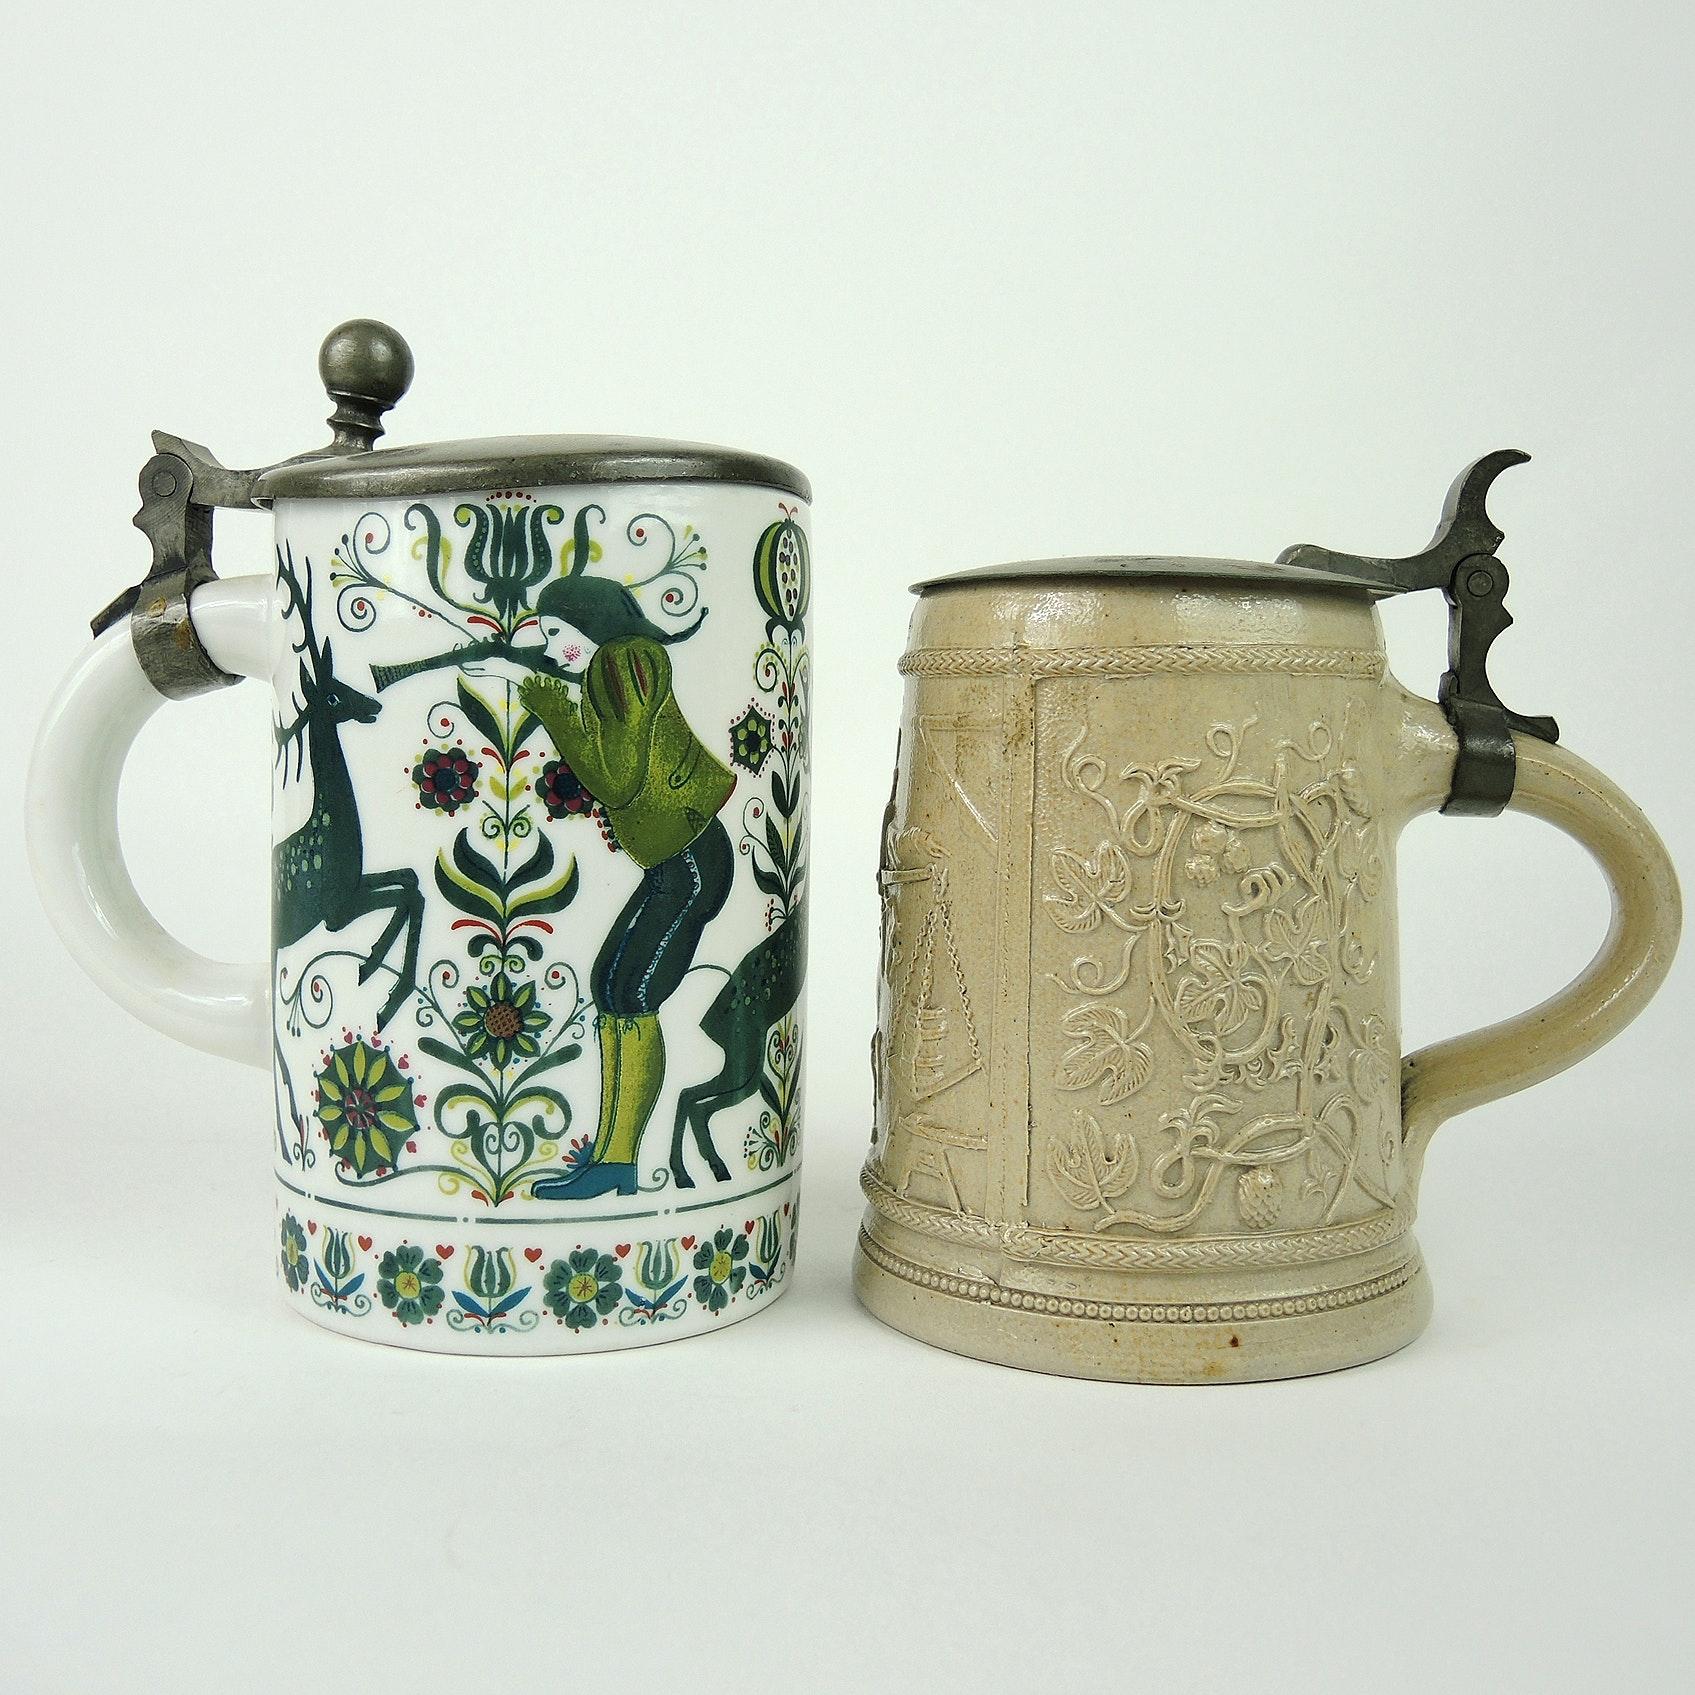 19th Cent. German Salt Glaze Pottery and Porcelain Beer Stein